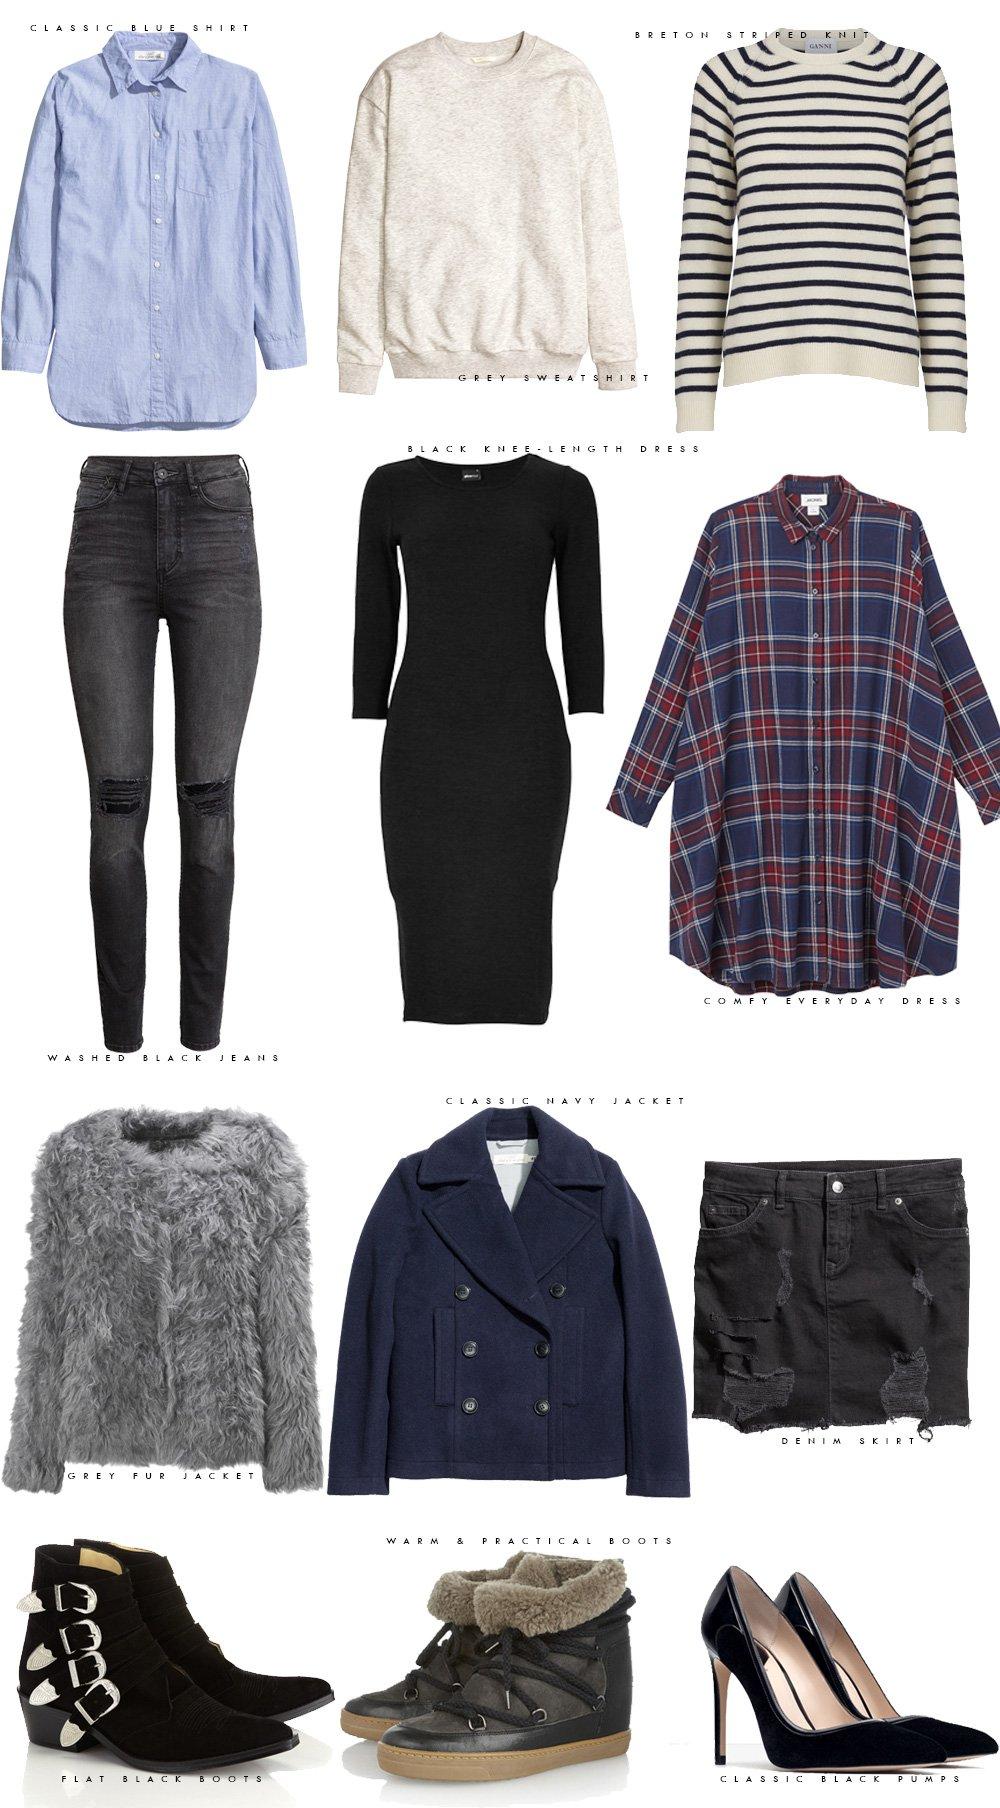 PAKKELISTEN - 12 items, 1 uges outfits..